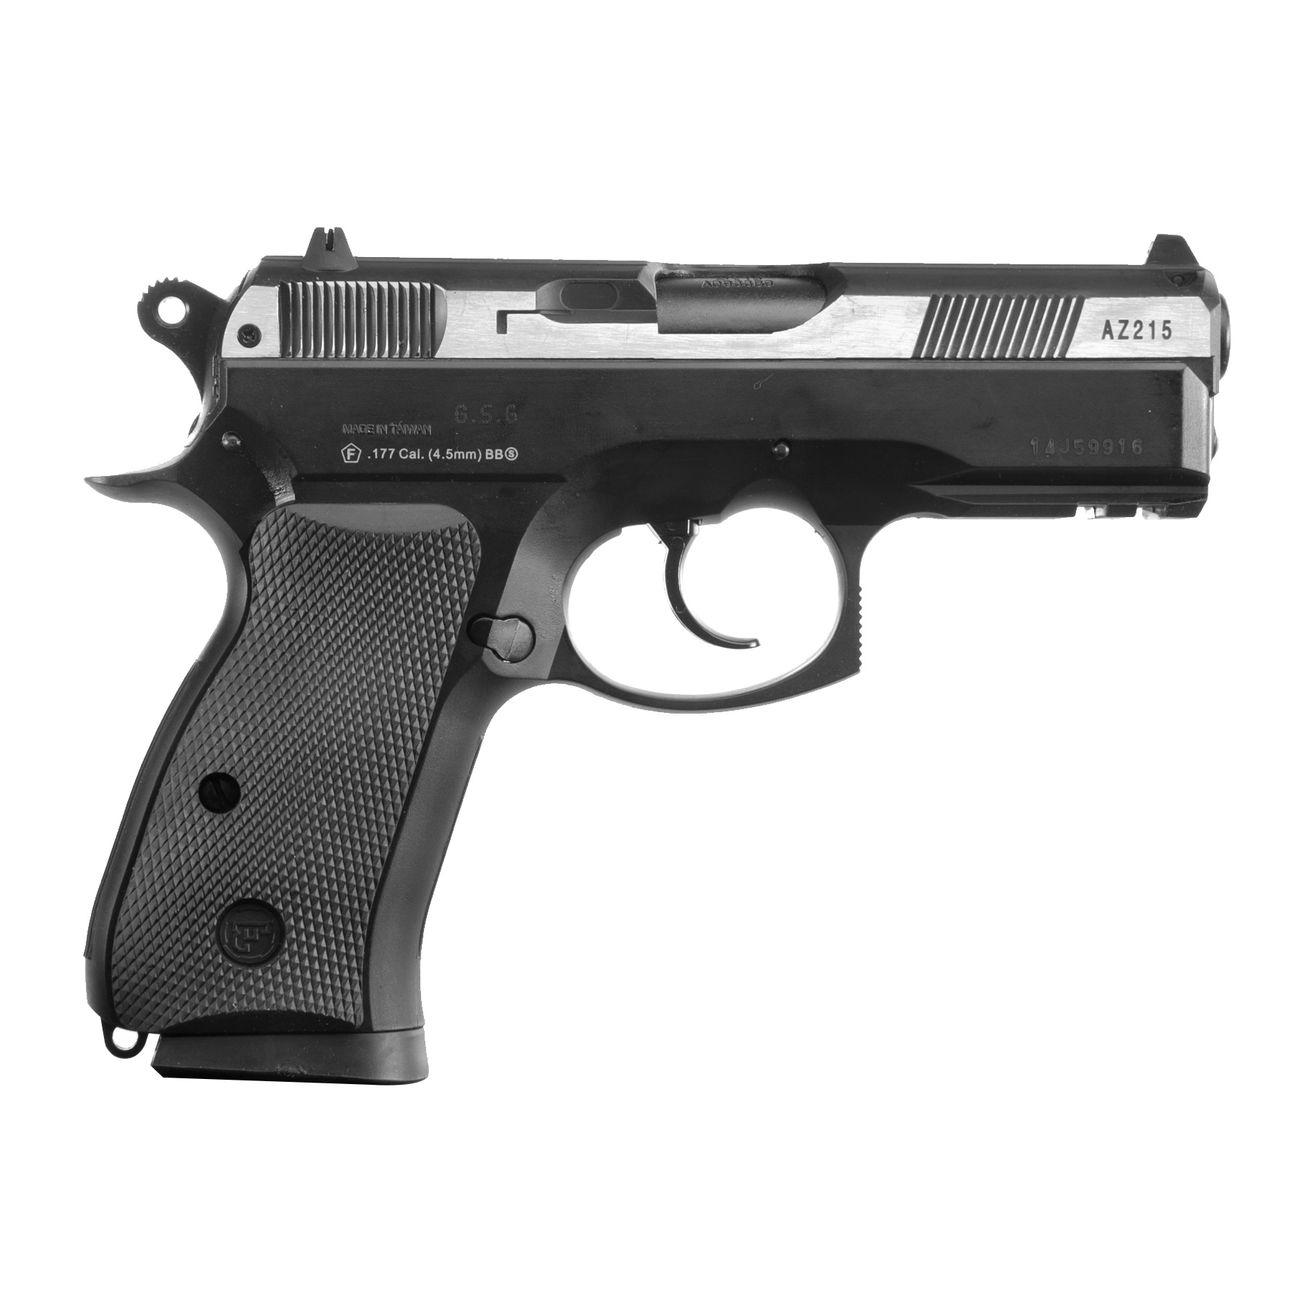 asg cz 75d compact m metallschlitten 4 5mm bb co2 pistole. Black Bedroom Furniture Sets. Home Design Ideas